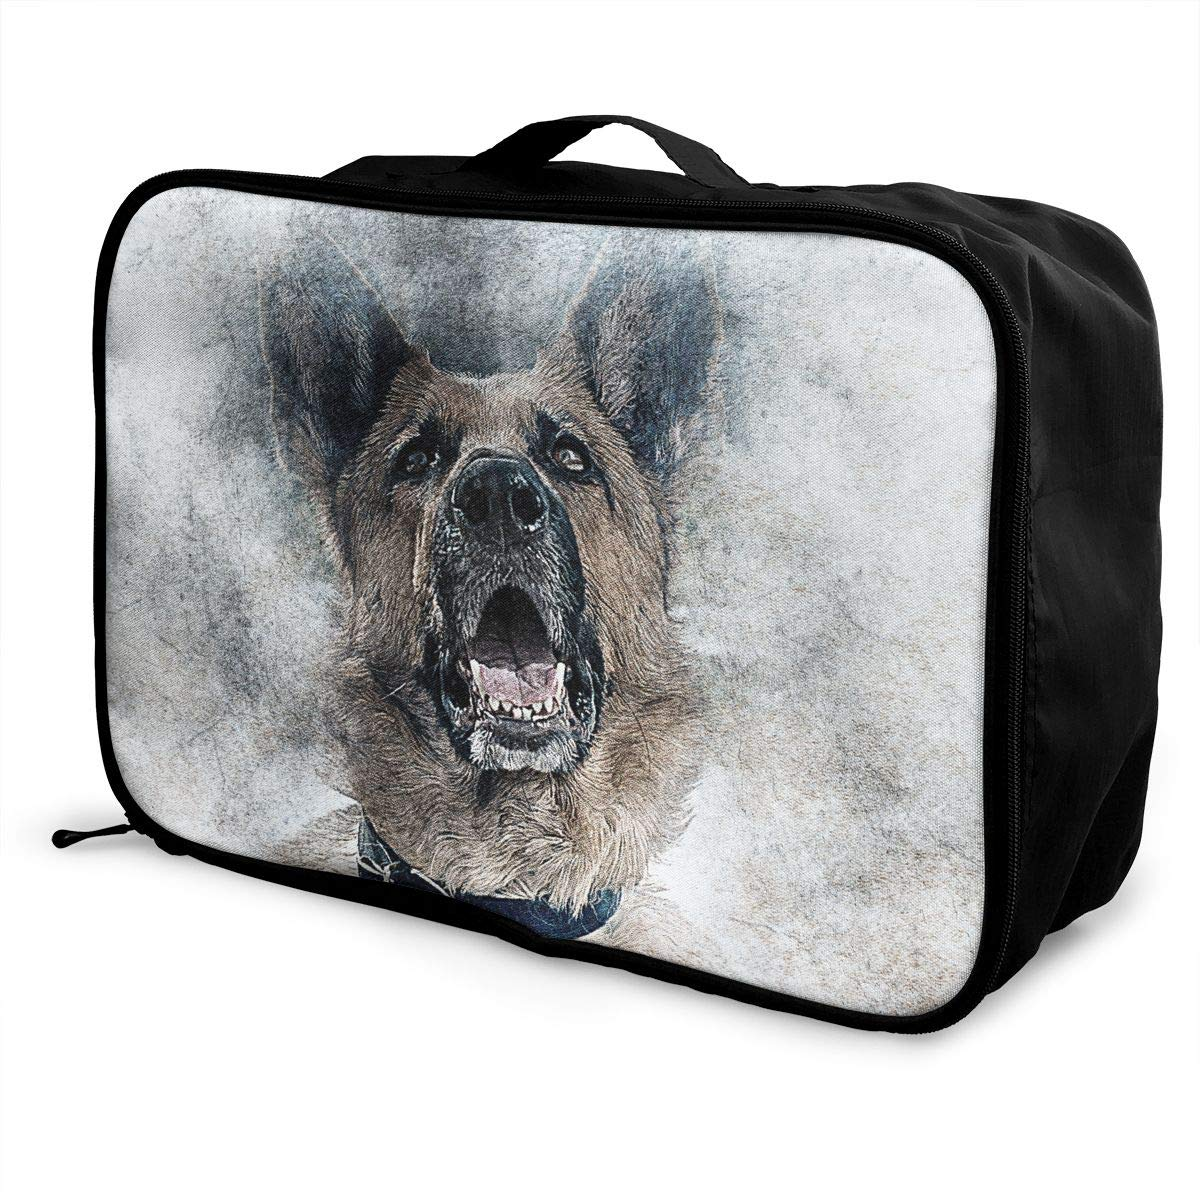 ADGAI Roaring Dog Cute Canvas Travel Weekender Bag,Fashion Custom Lightweight Large Capacity Portable Luggage Bag,Suitcase Trolley Bag